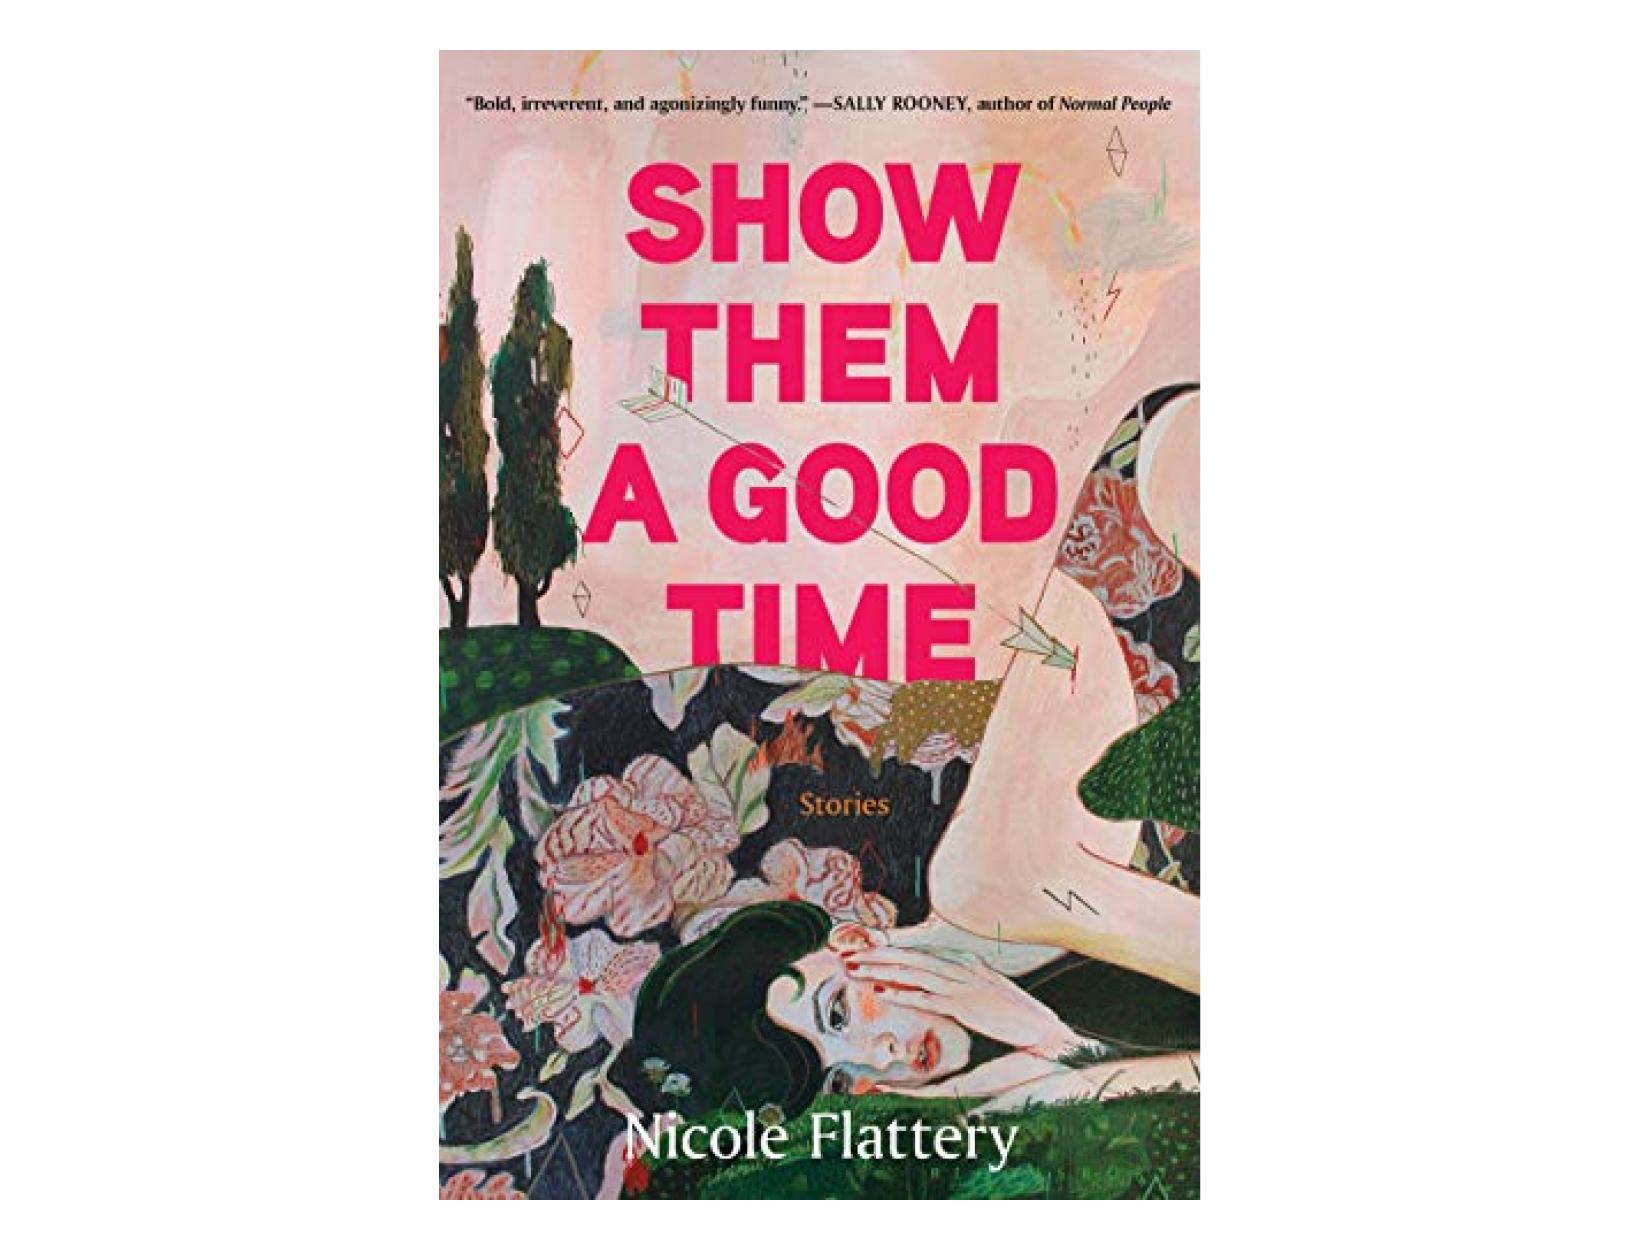 <em>autor Nicole Flattery